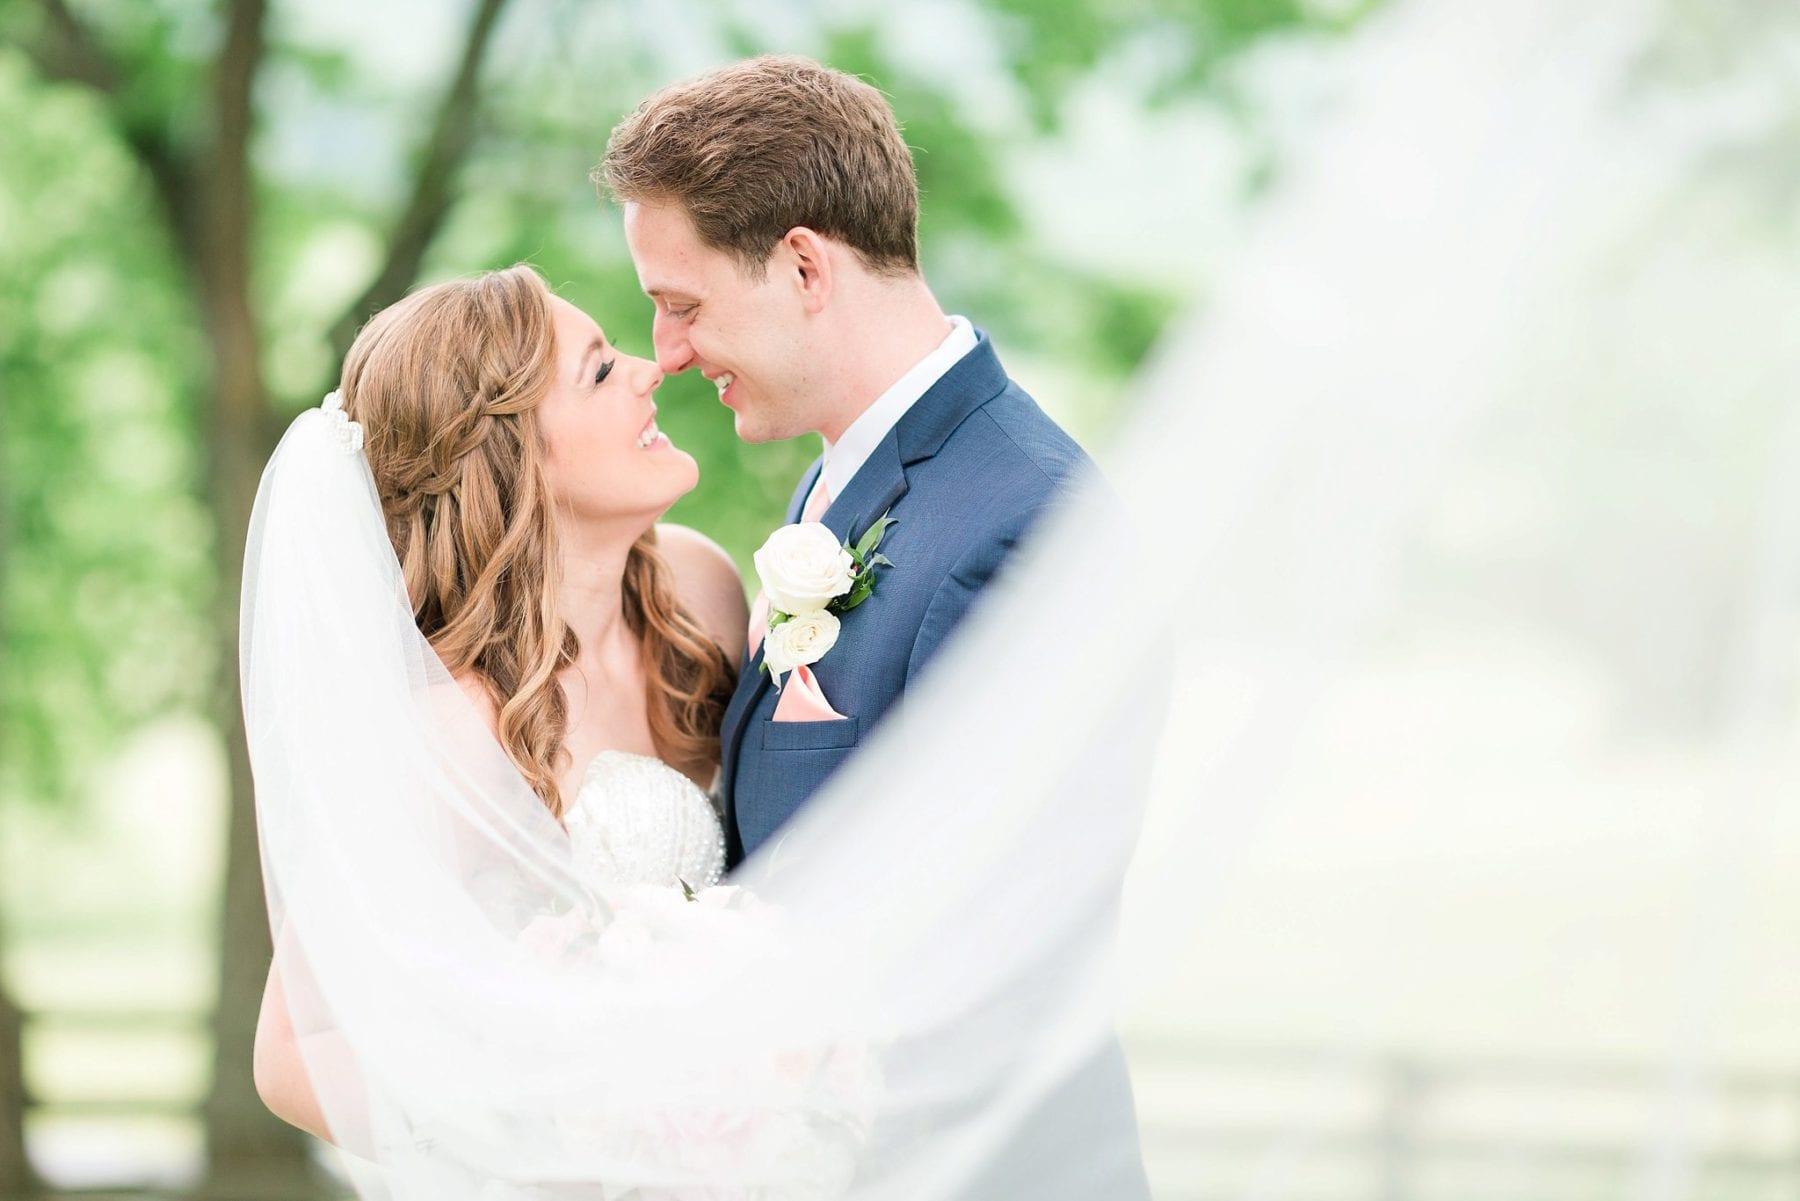 Justin & Megan Big Spring Farm Wedding Photos-188.jpg